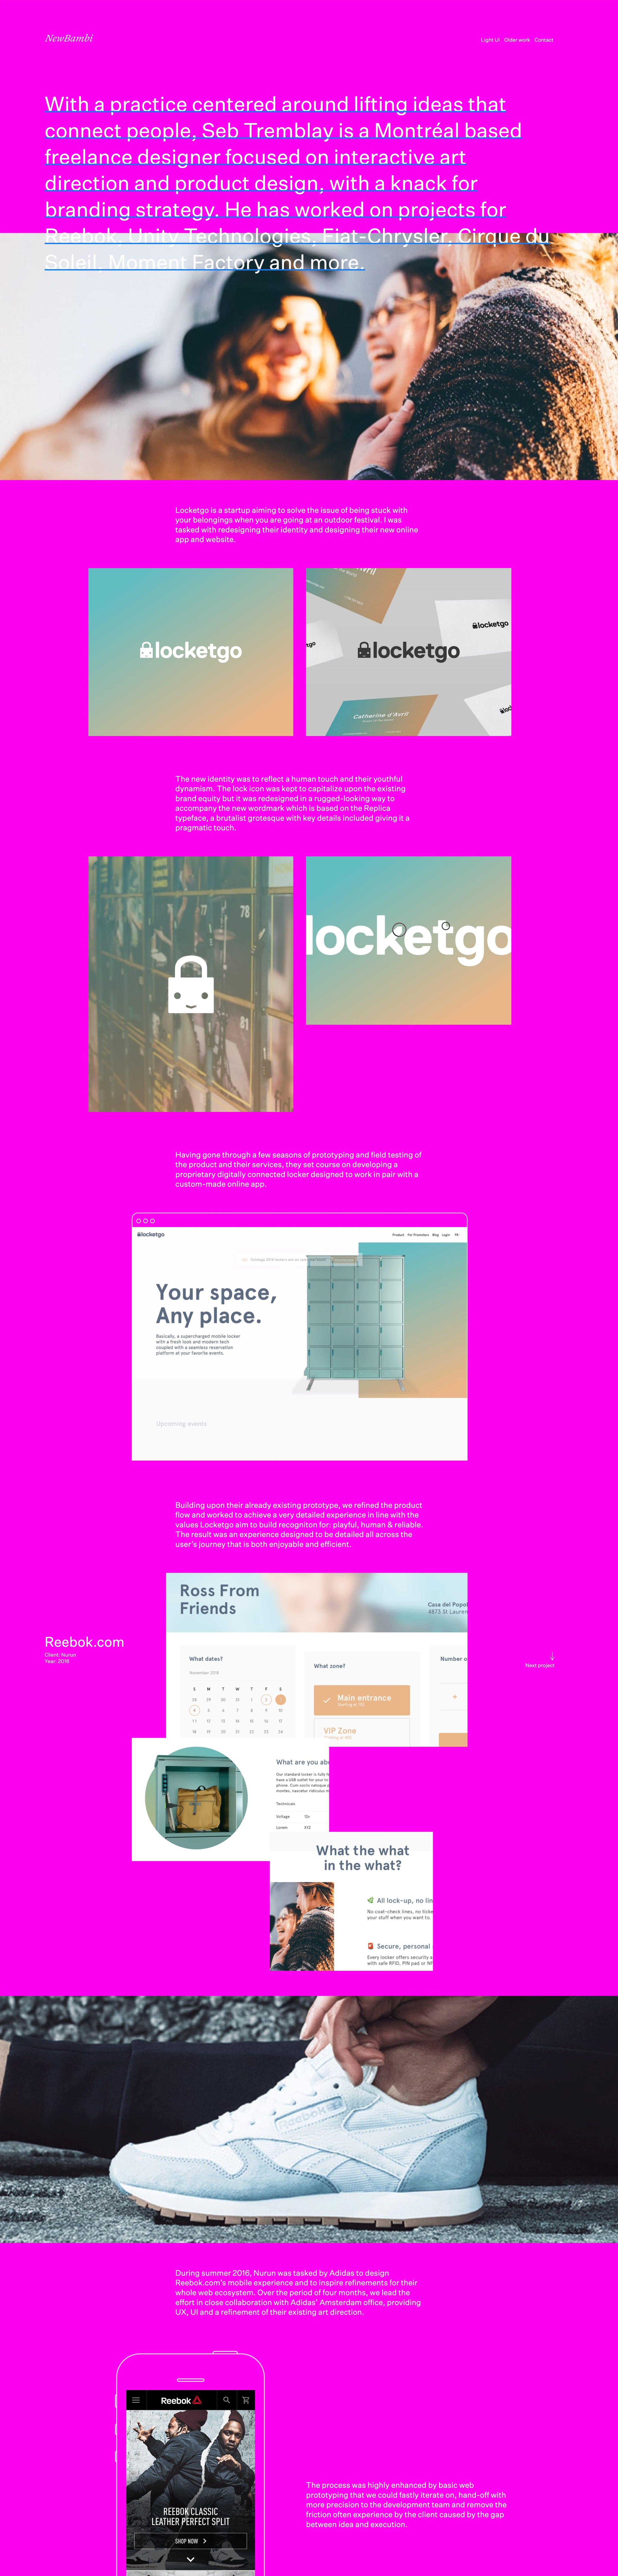 NewBambi Website Screenshot